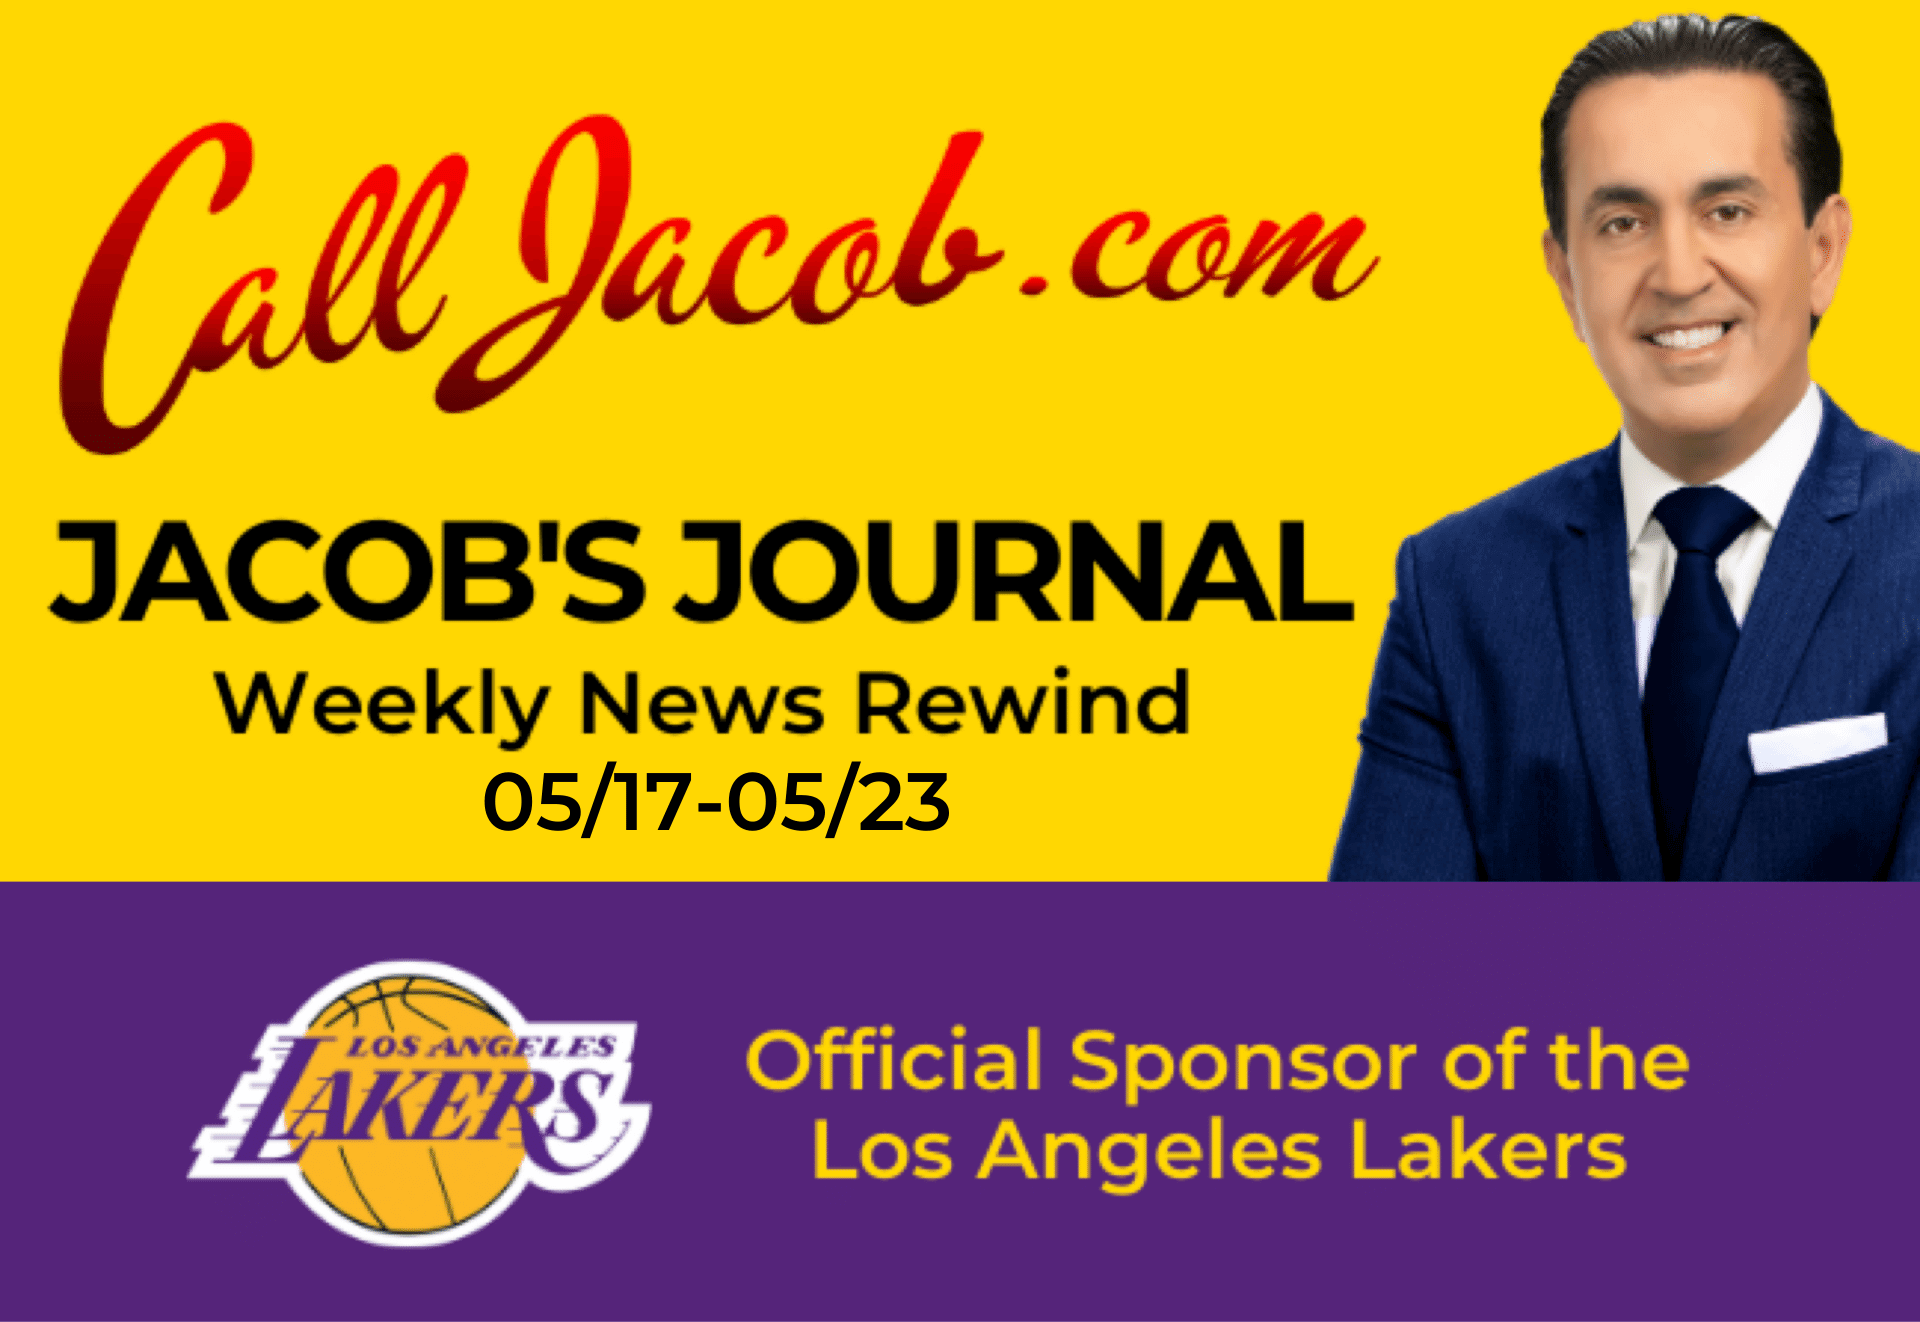 JacobsJournalWeeklyNewsRewind May 17th to May 23rd 2021